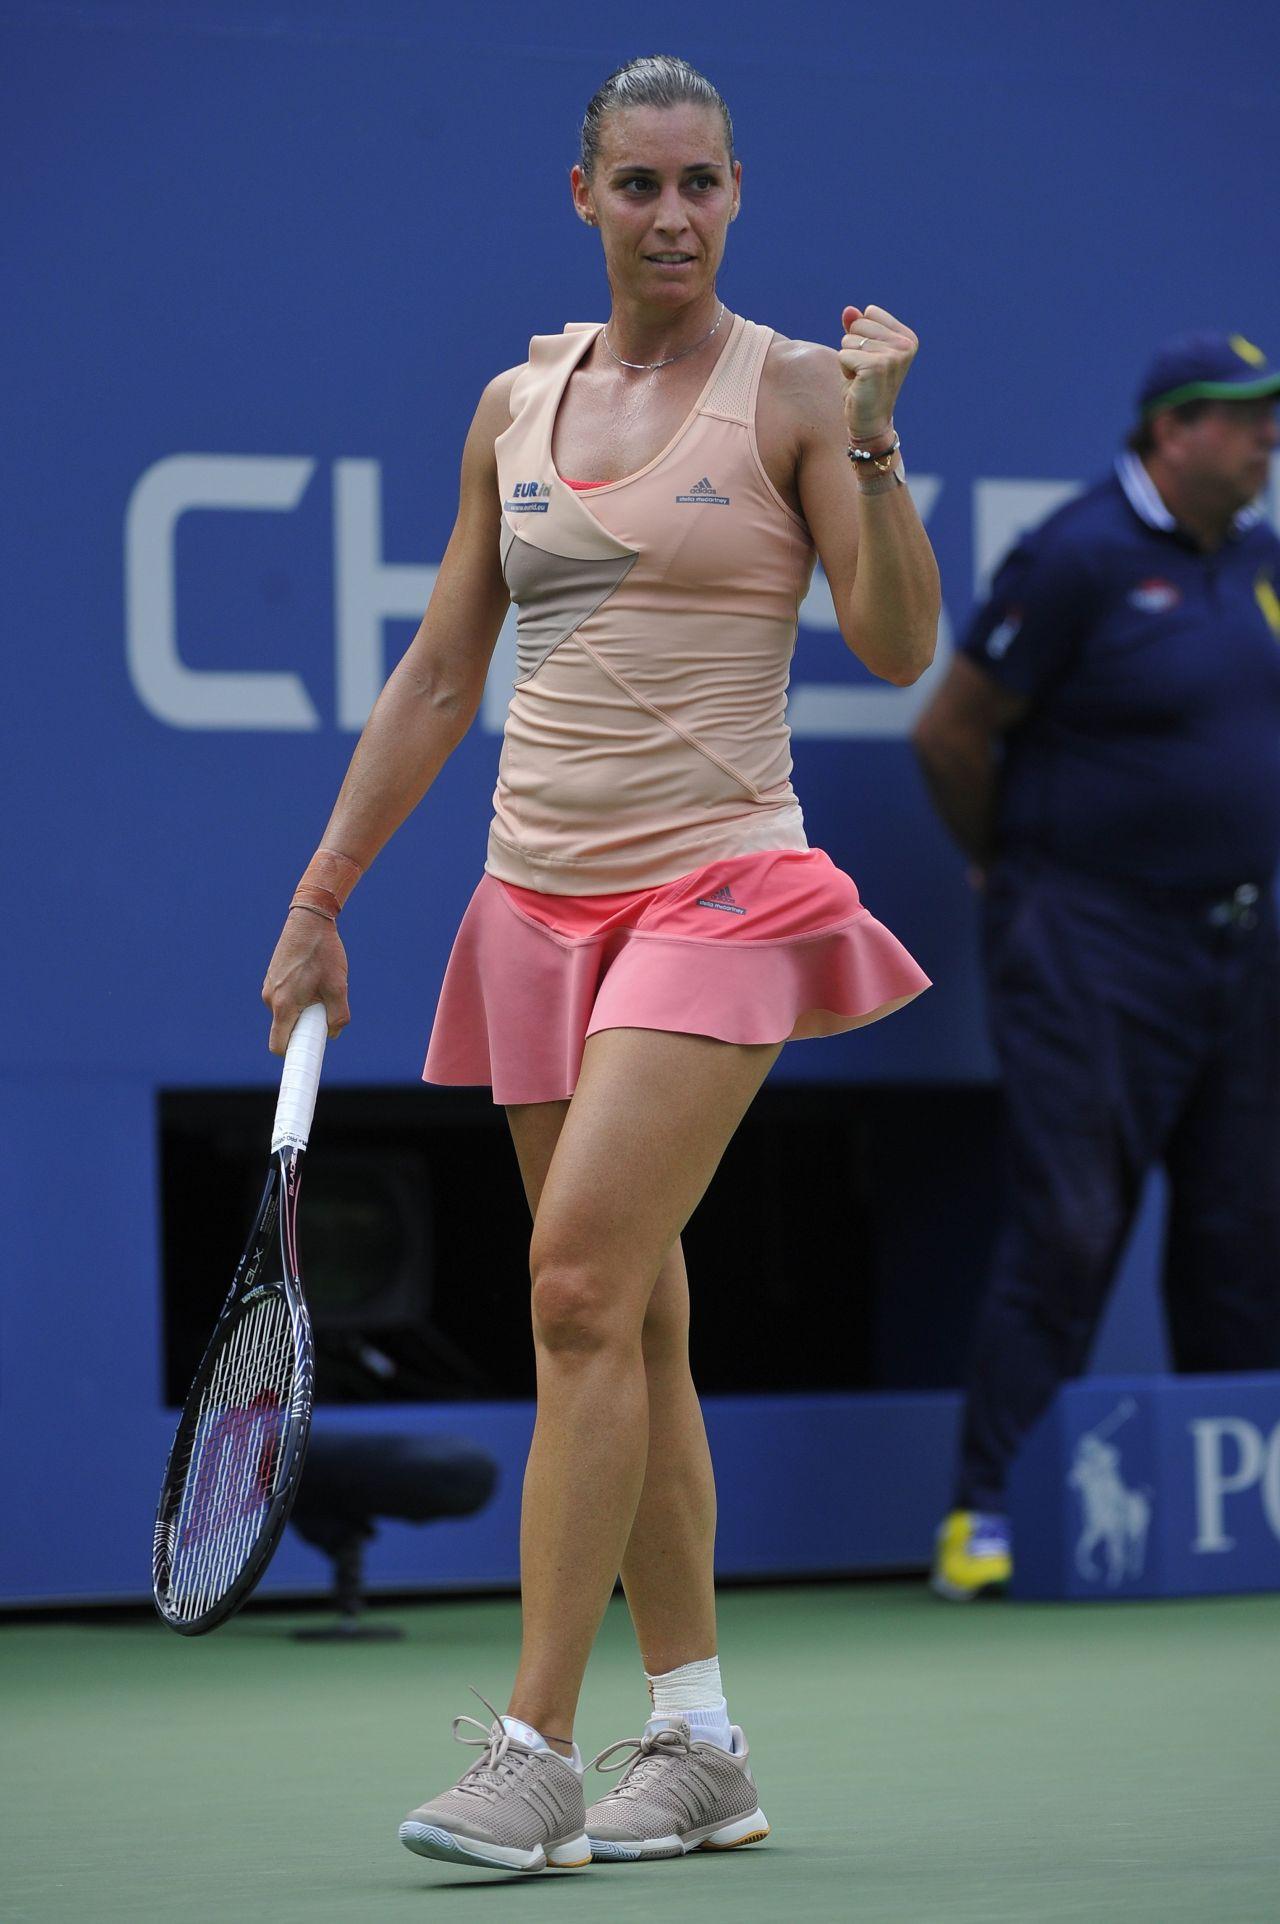 Flavia Pennetta – 2014 U.S. Open Tennis Tournament in New York City – 4th Round